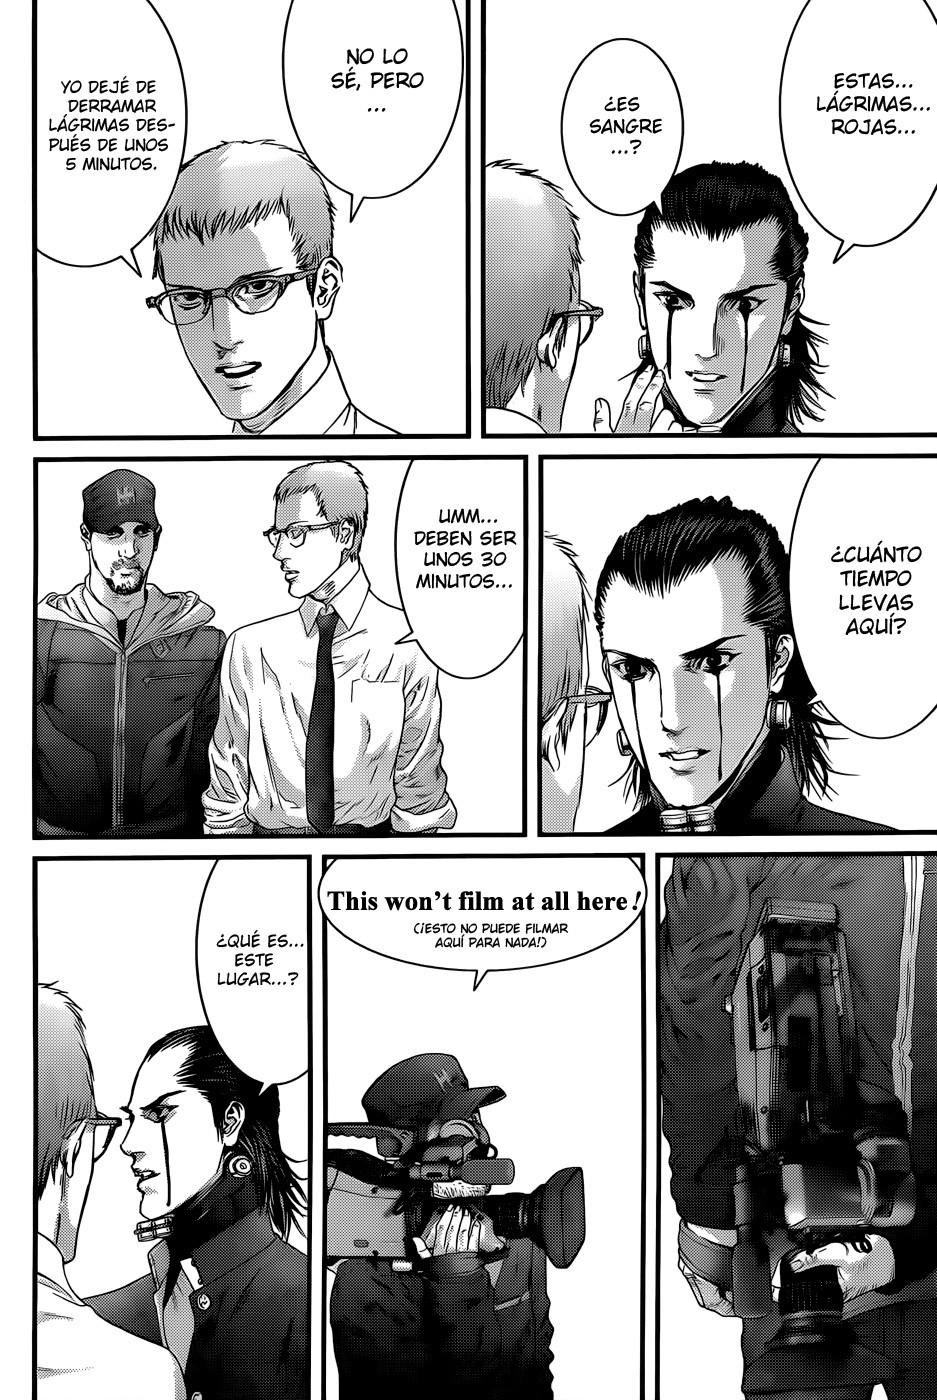 Manga Gantz capitulo 369 09